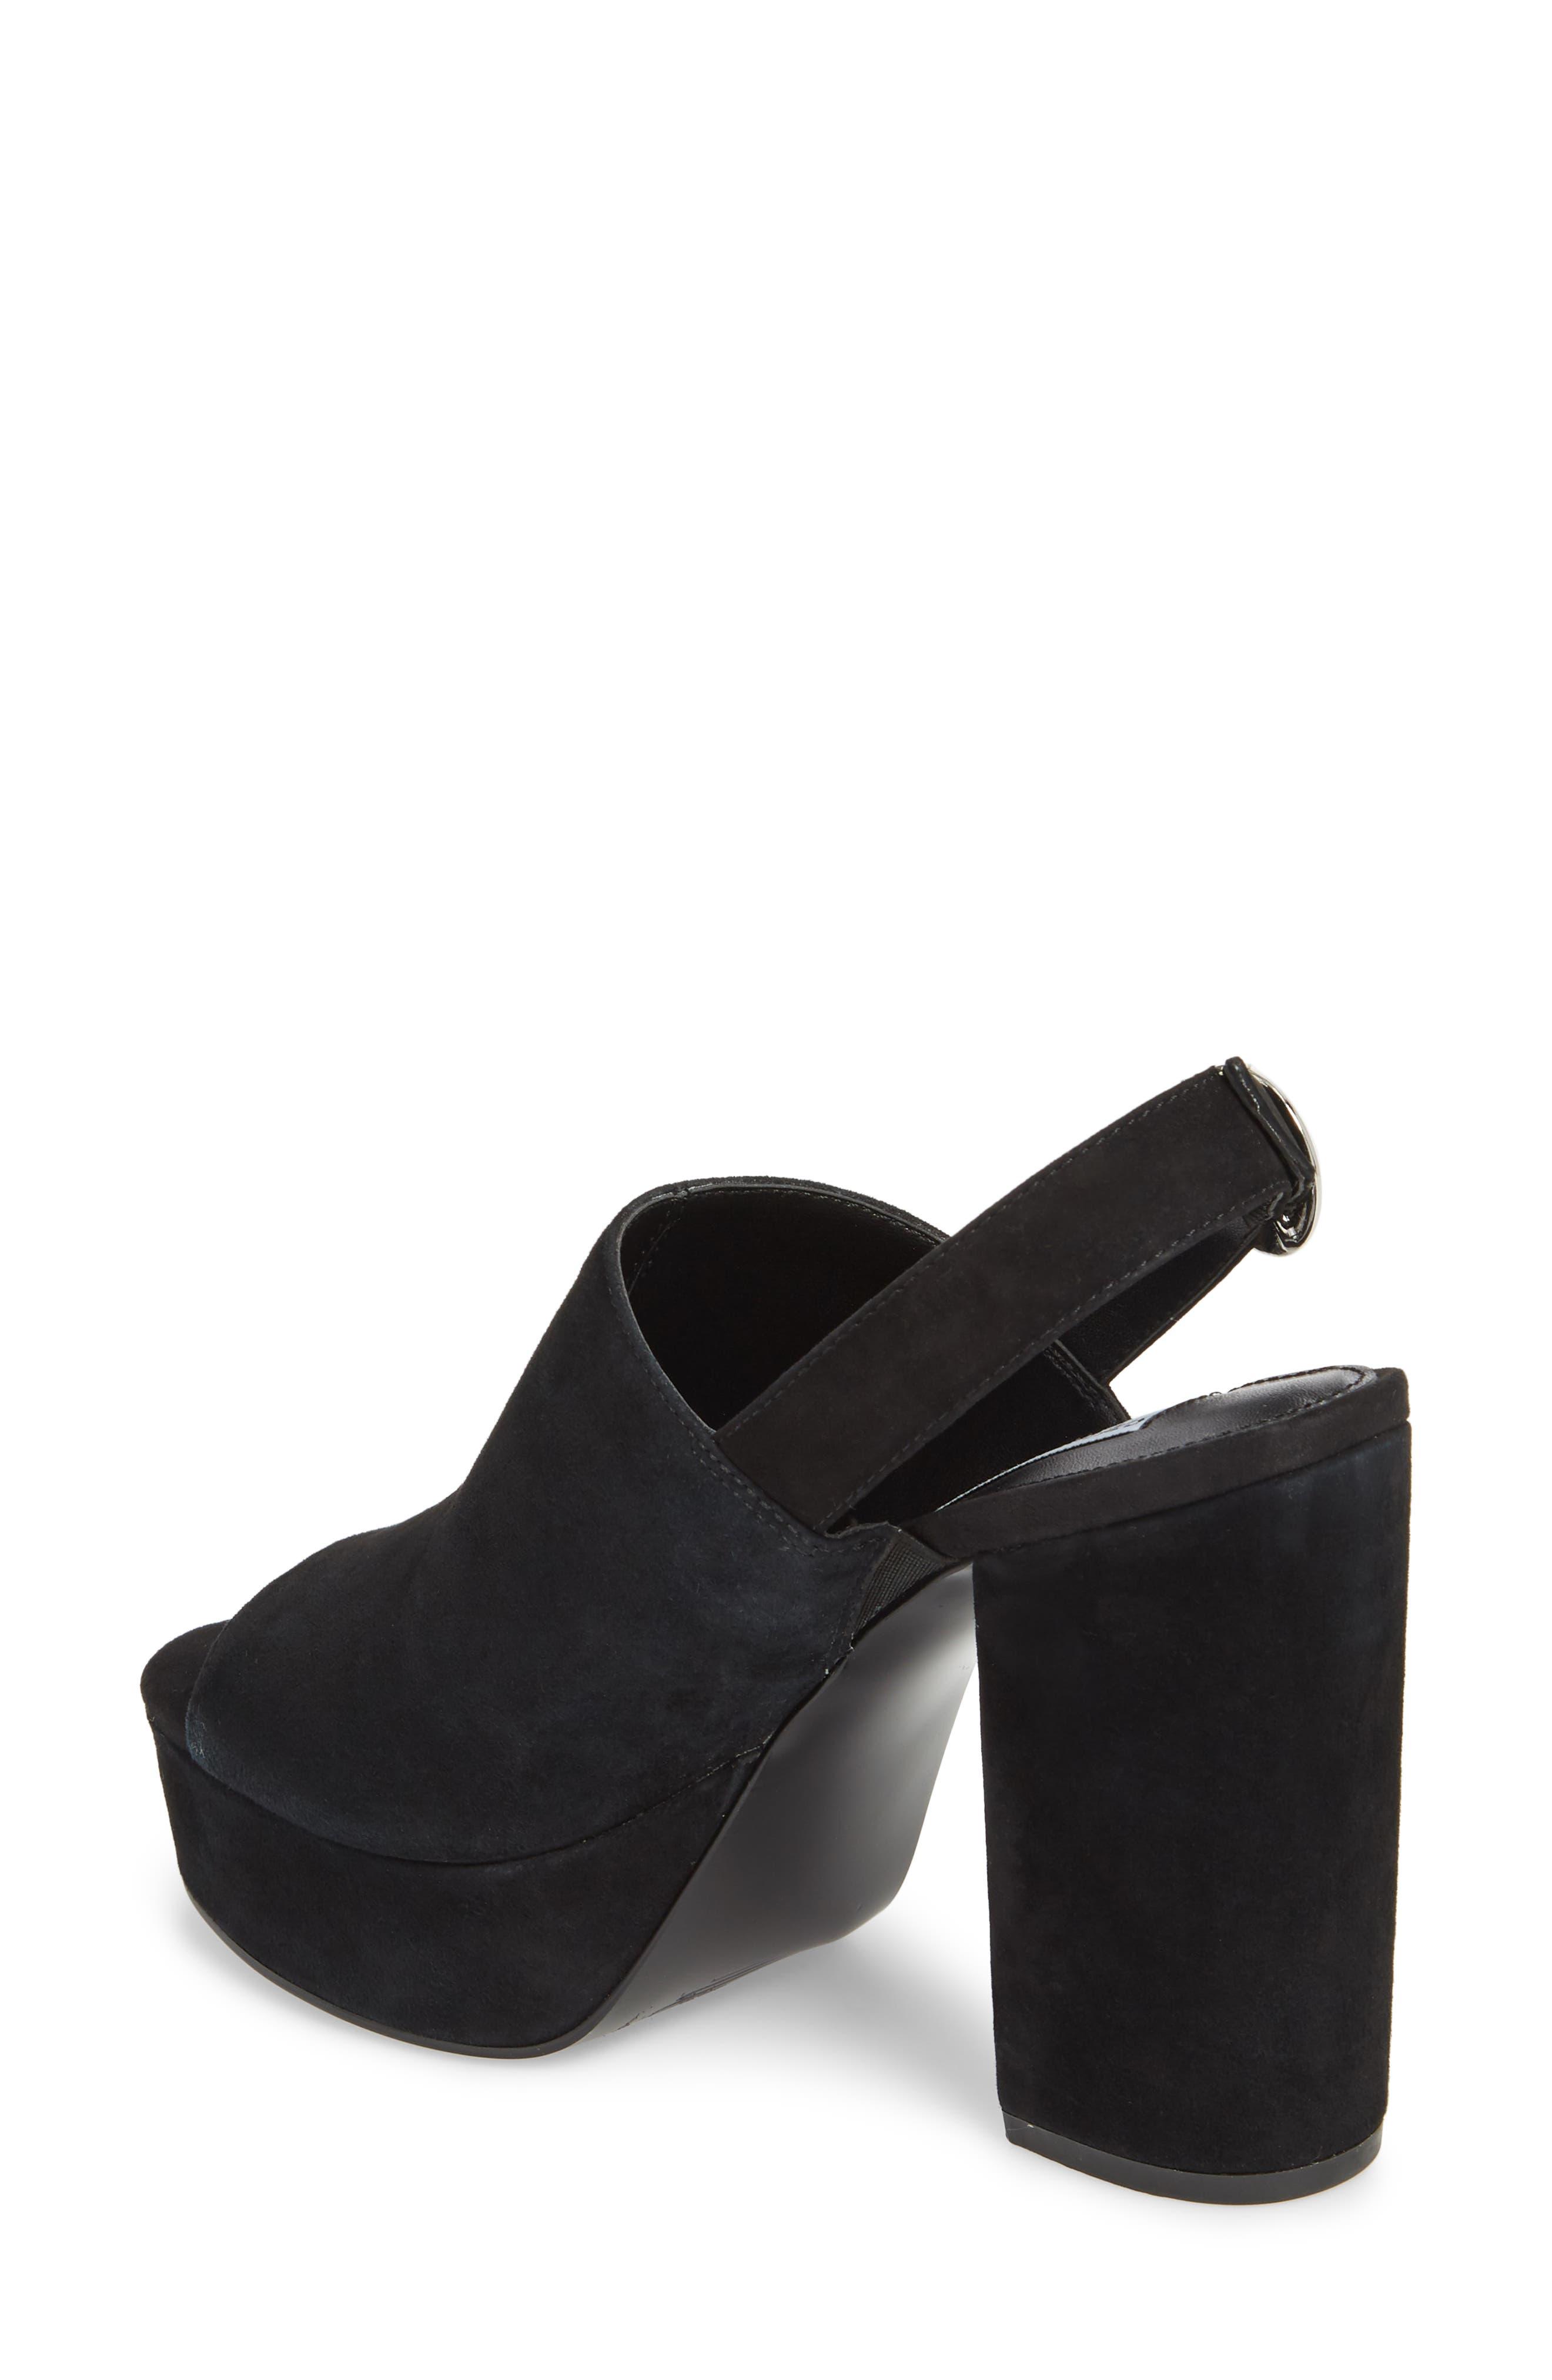 Carter Slingback Platform Sandal,                             Alternate thumbnail 2, color,                             006